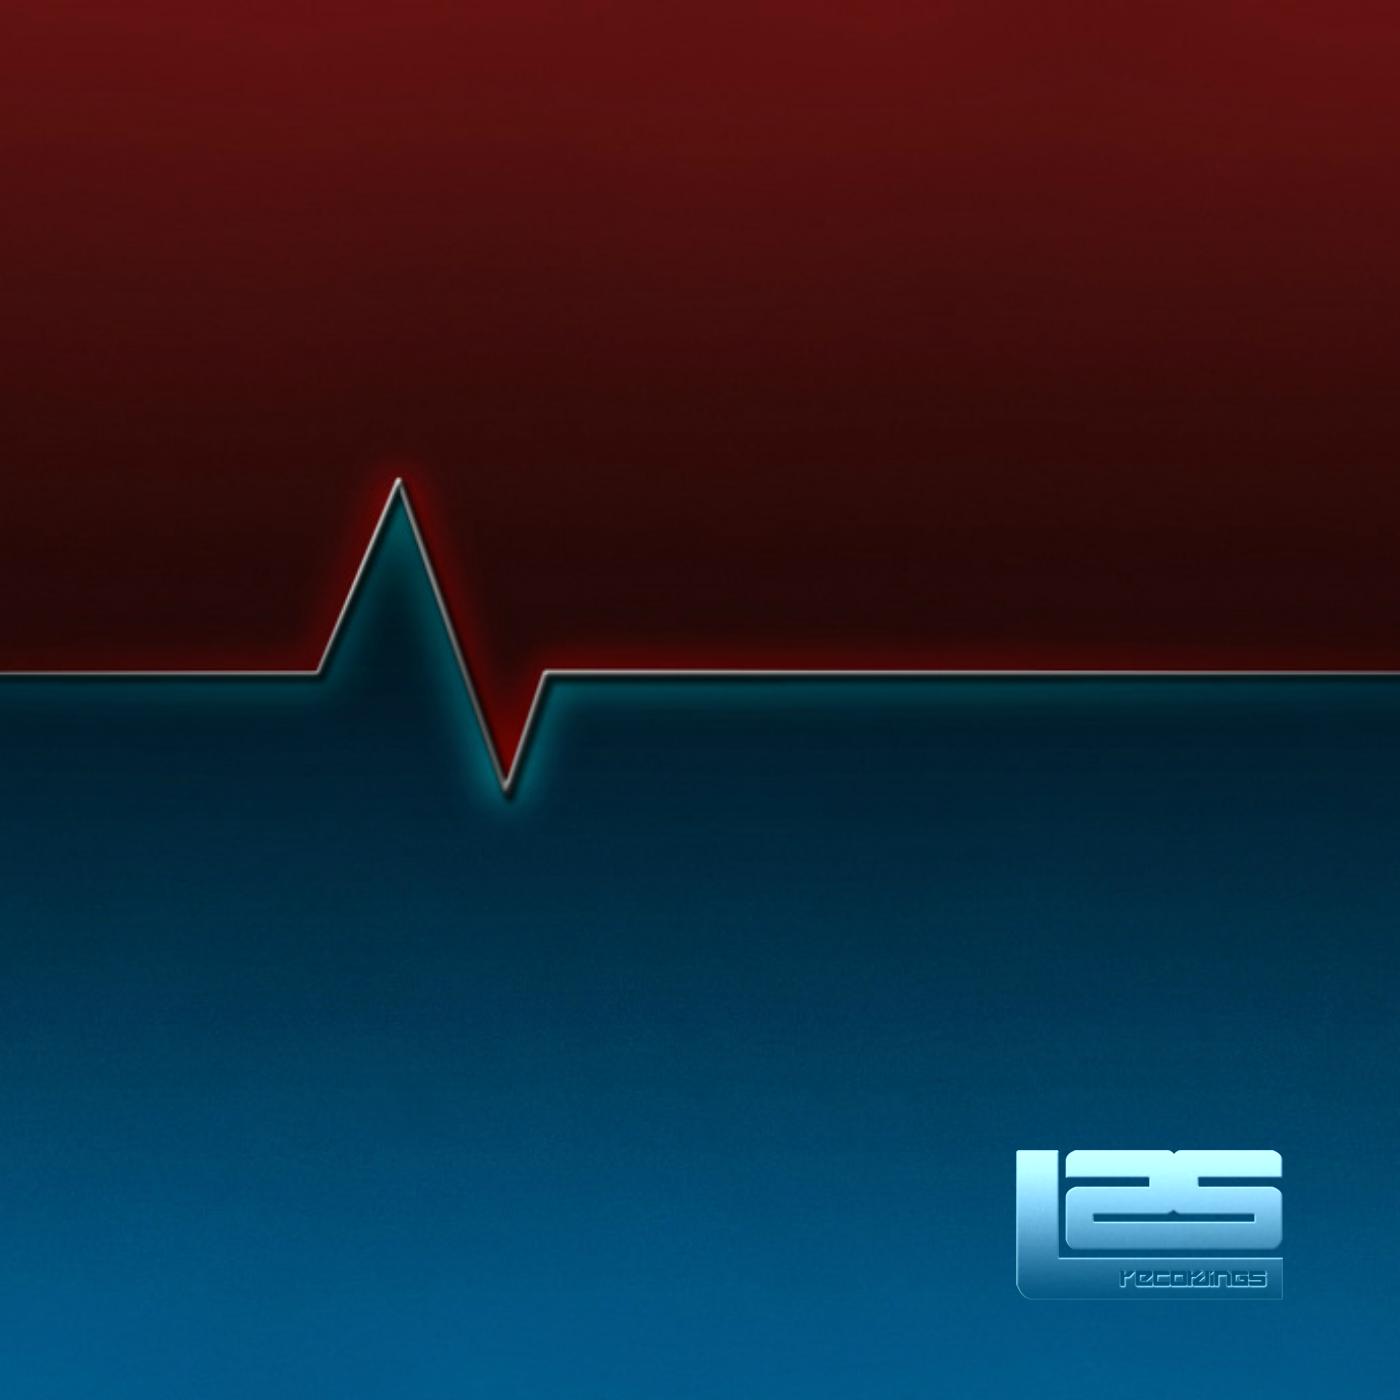 L2S107: HE3Dless - Nin-ya